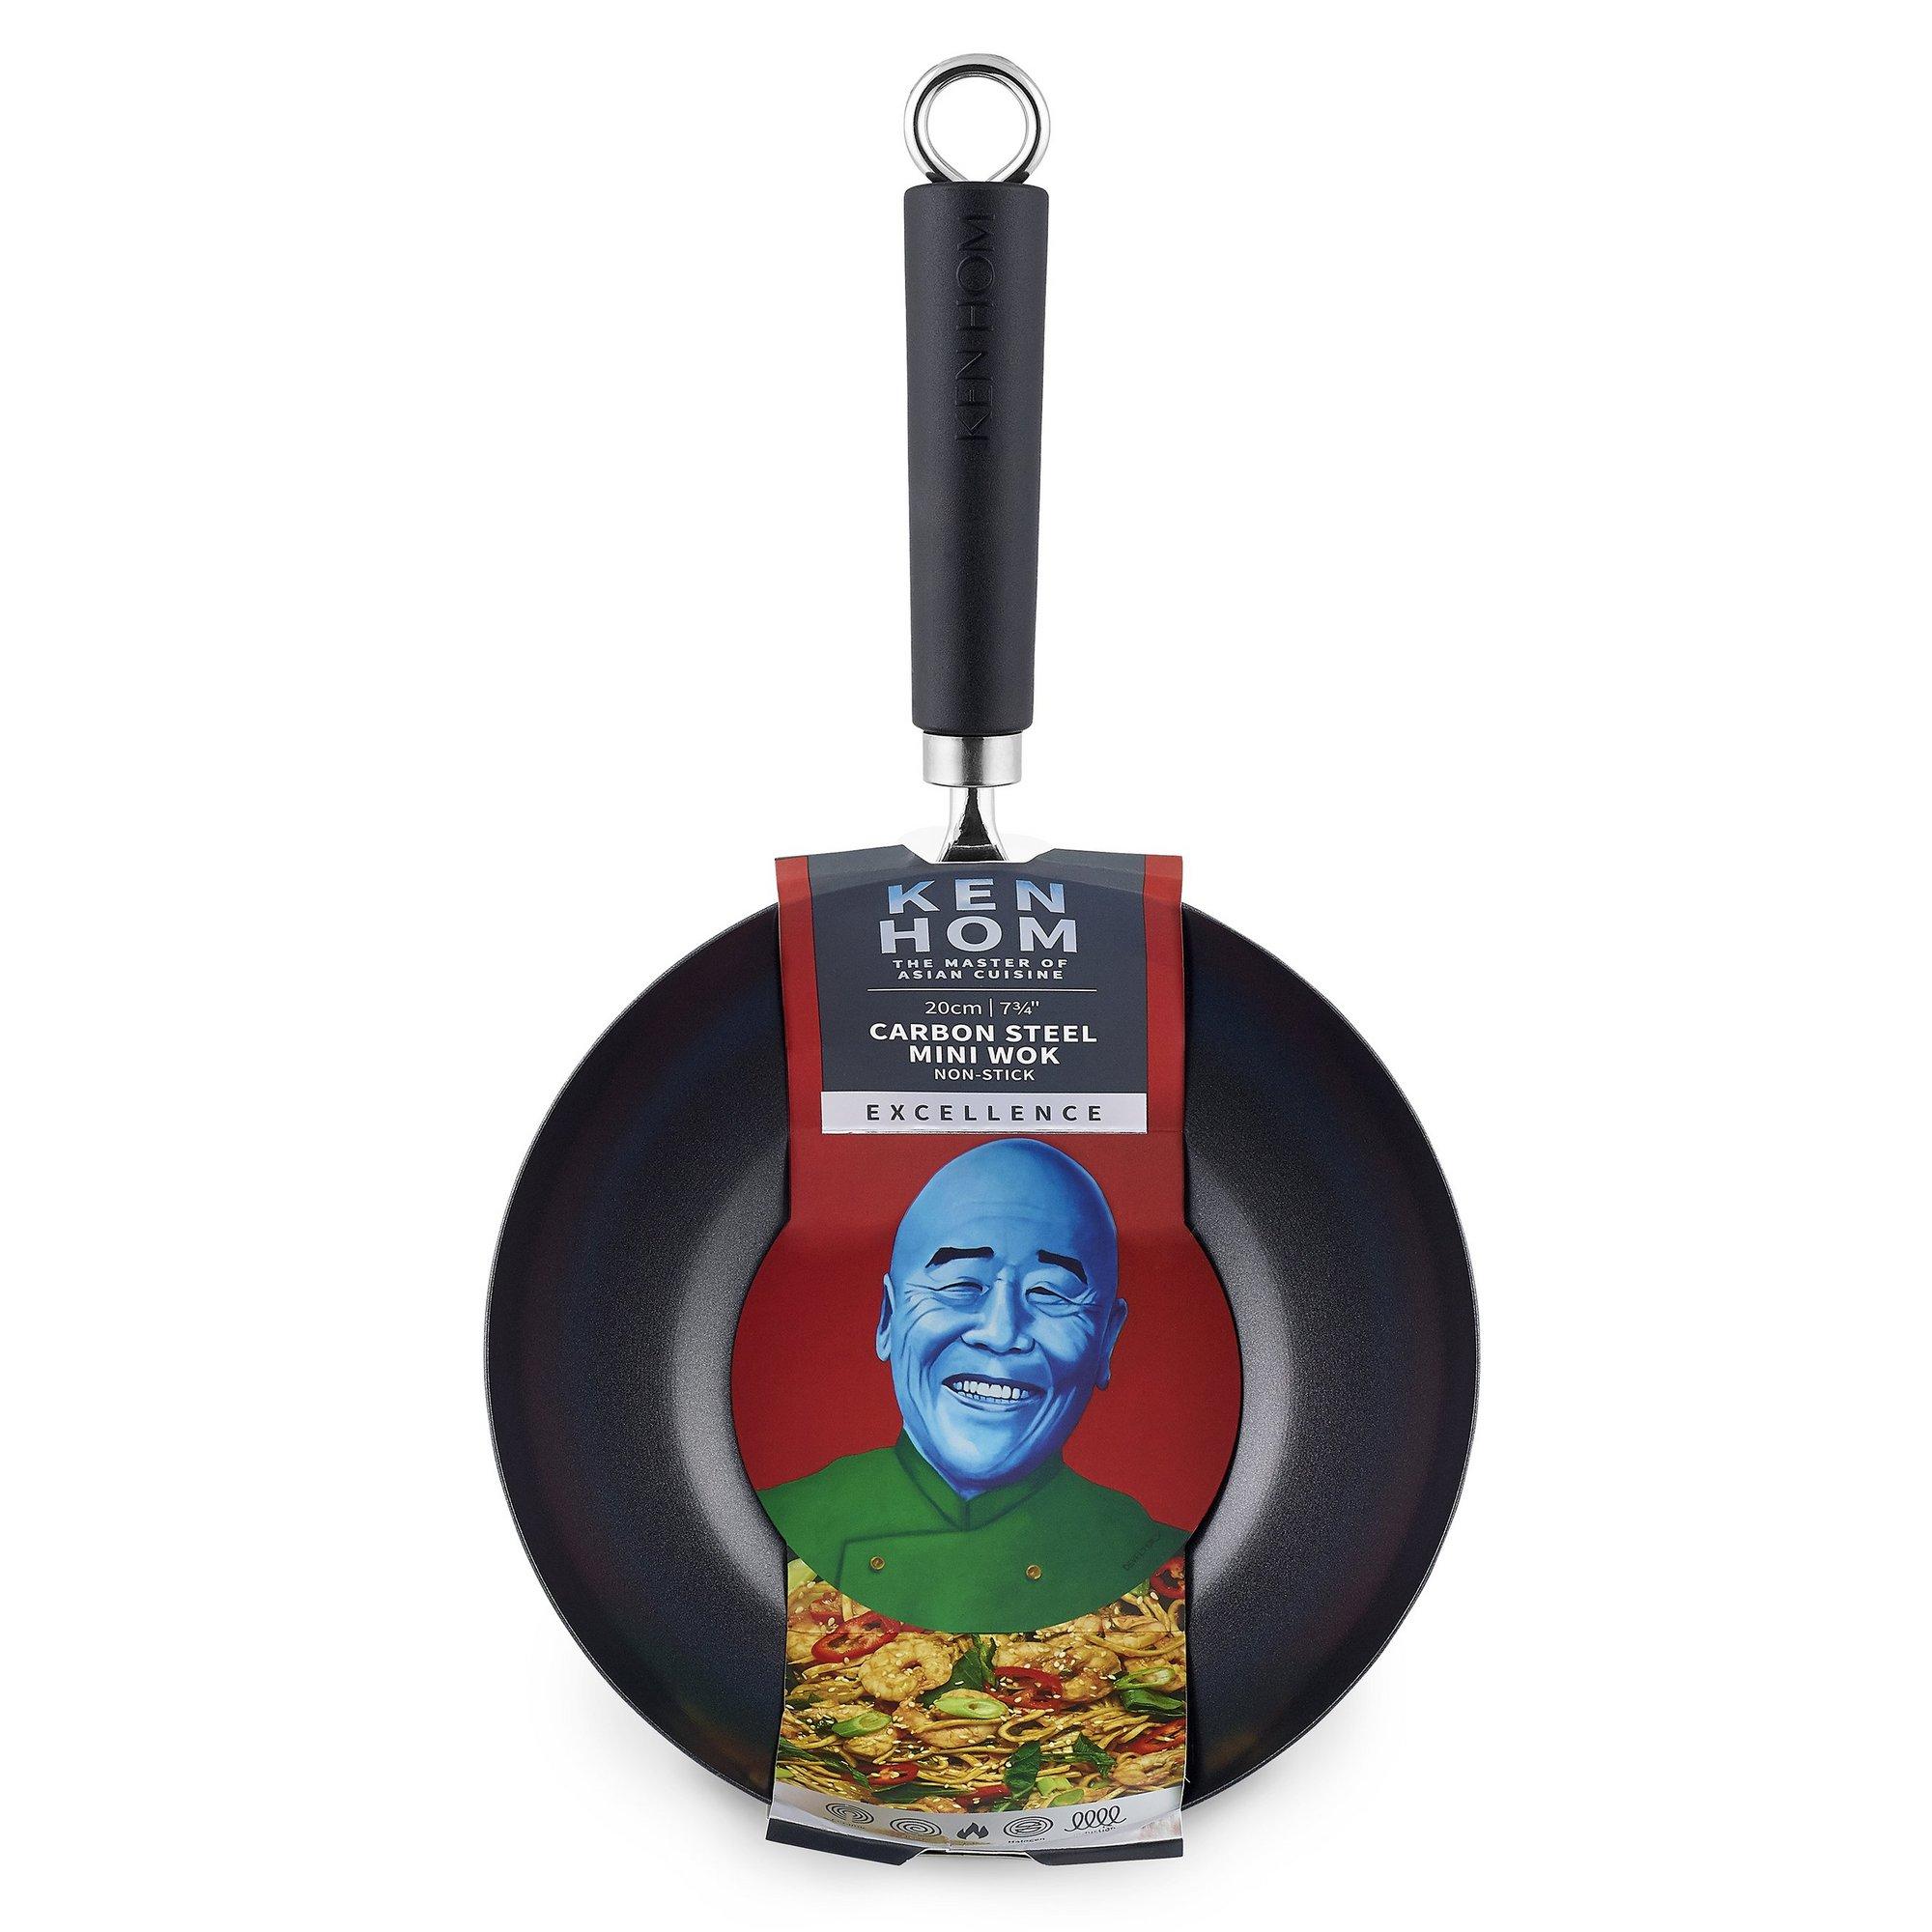 Image of Ken Hom Excellence 20cm Mini Wok